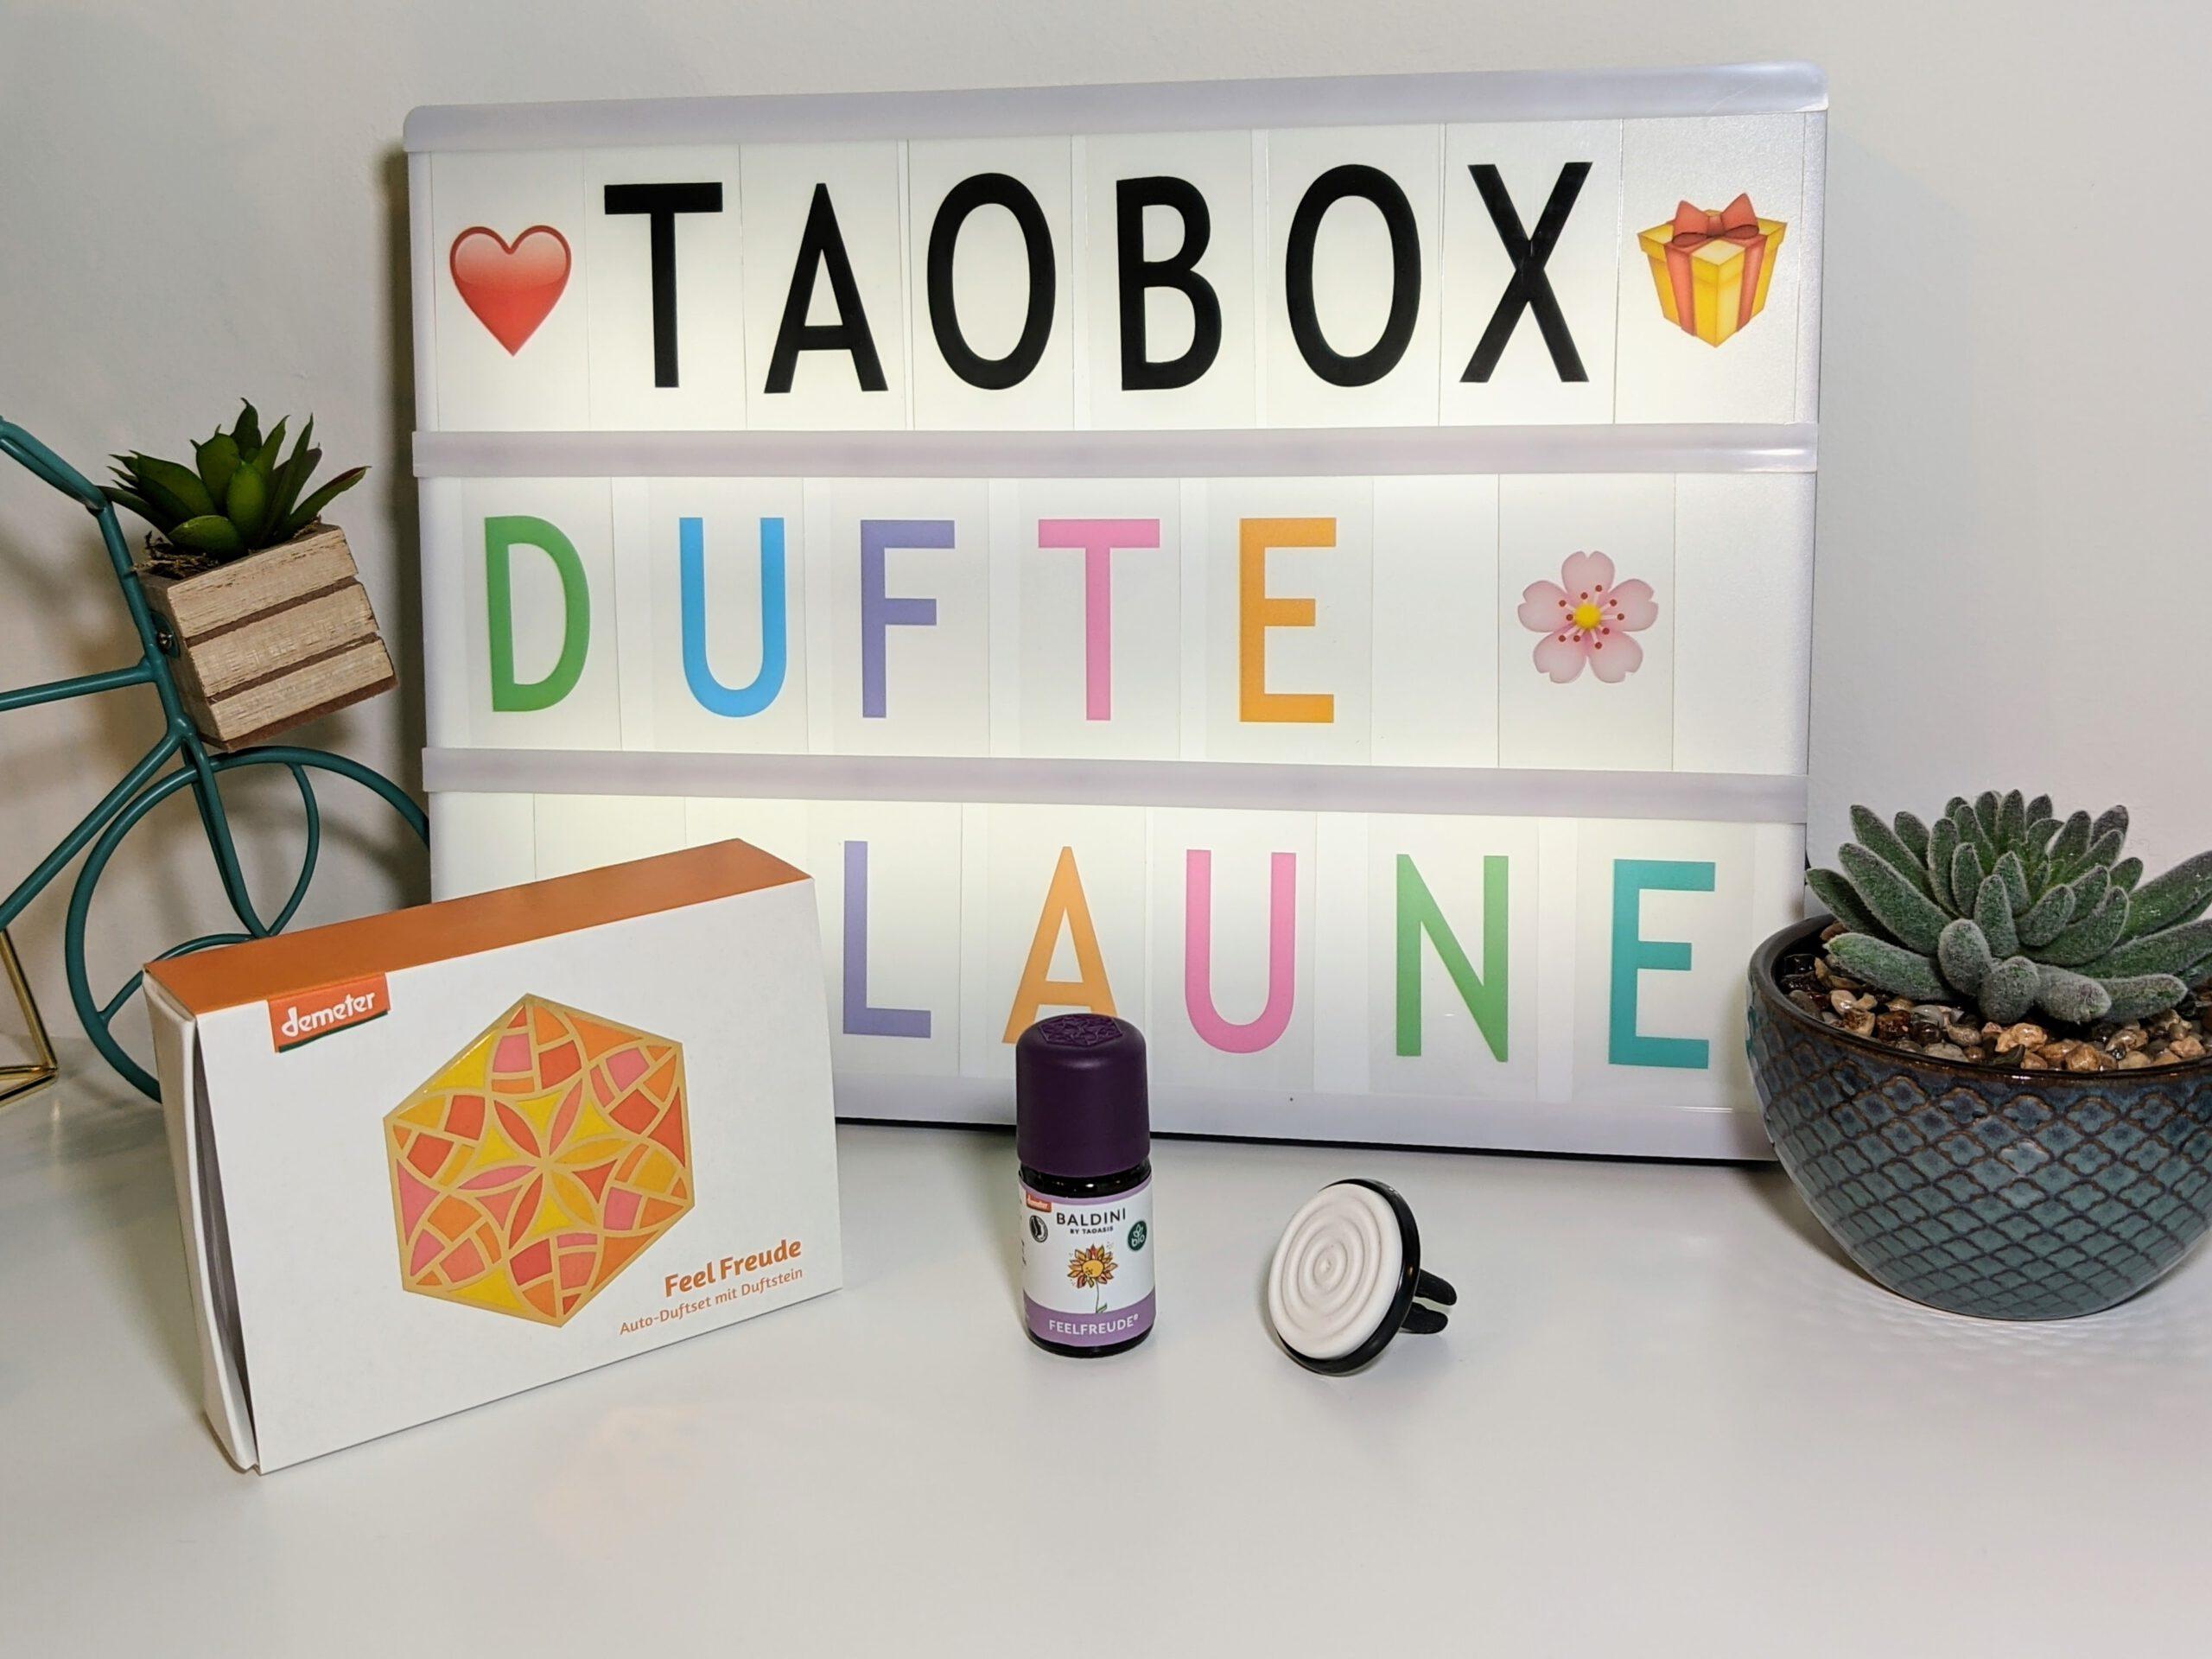 TaoBox – Dufte Laune – Auto-Duftset Feel Freude